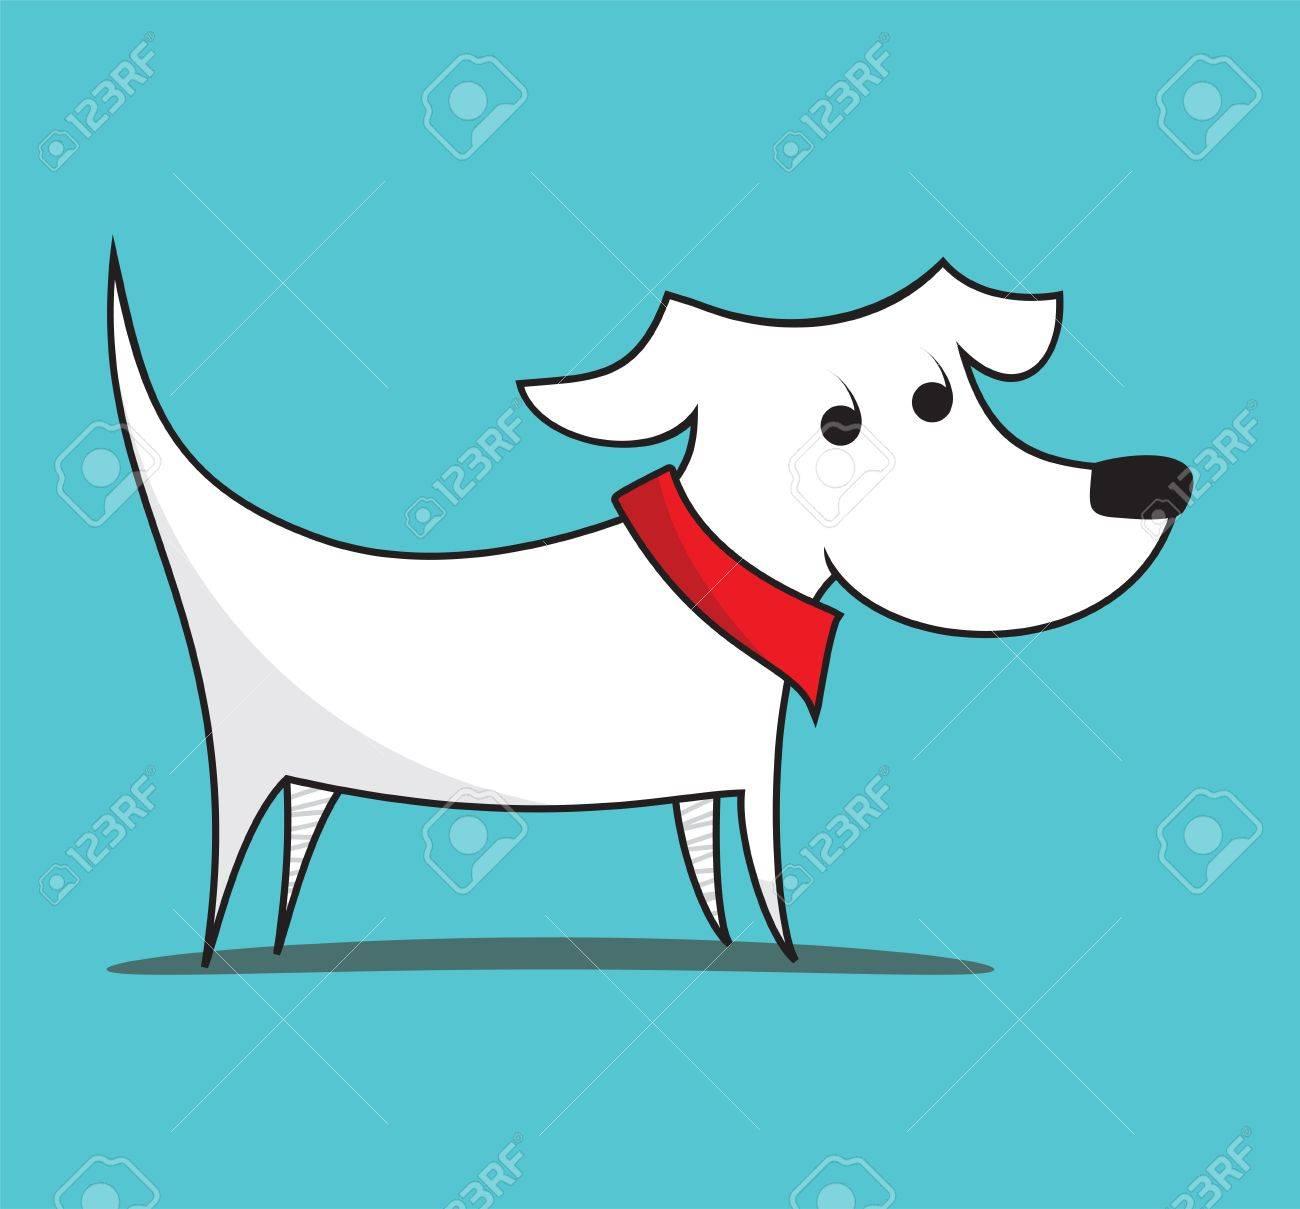 Dog illustration Stock Vector - 19263676